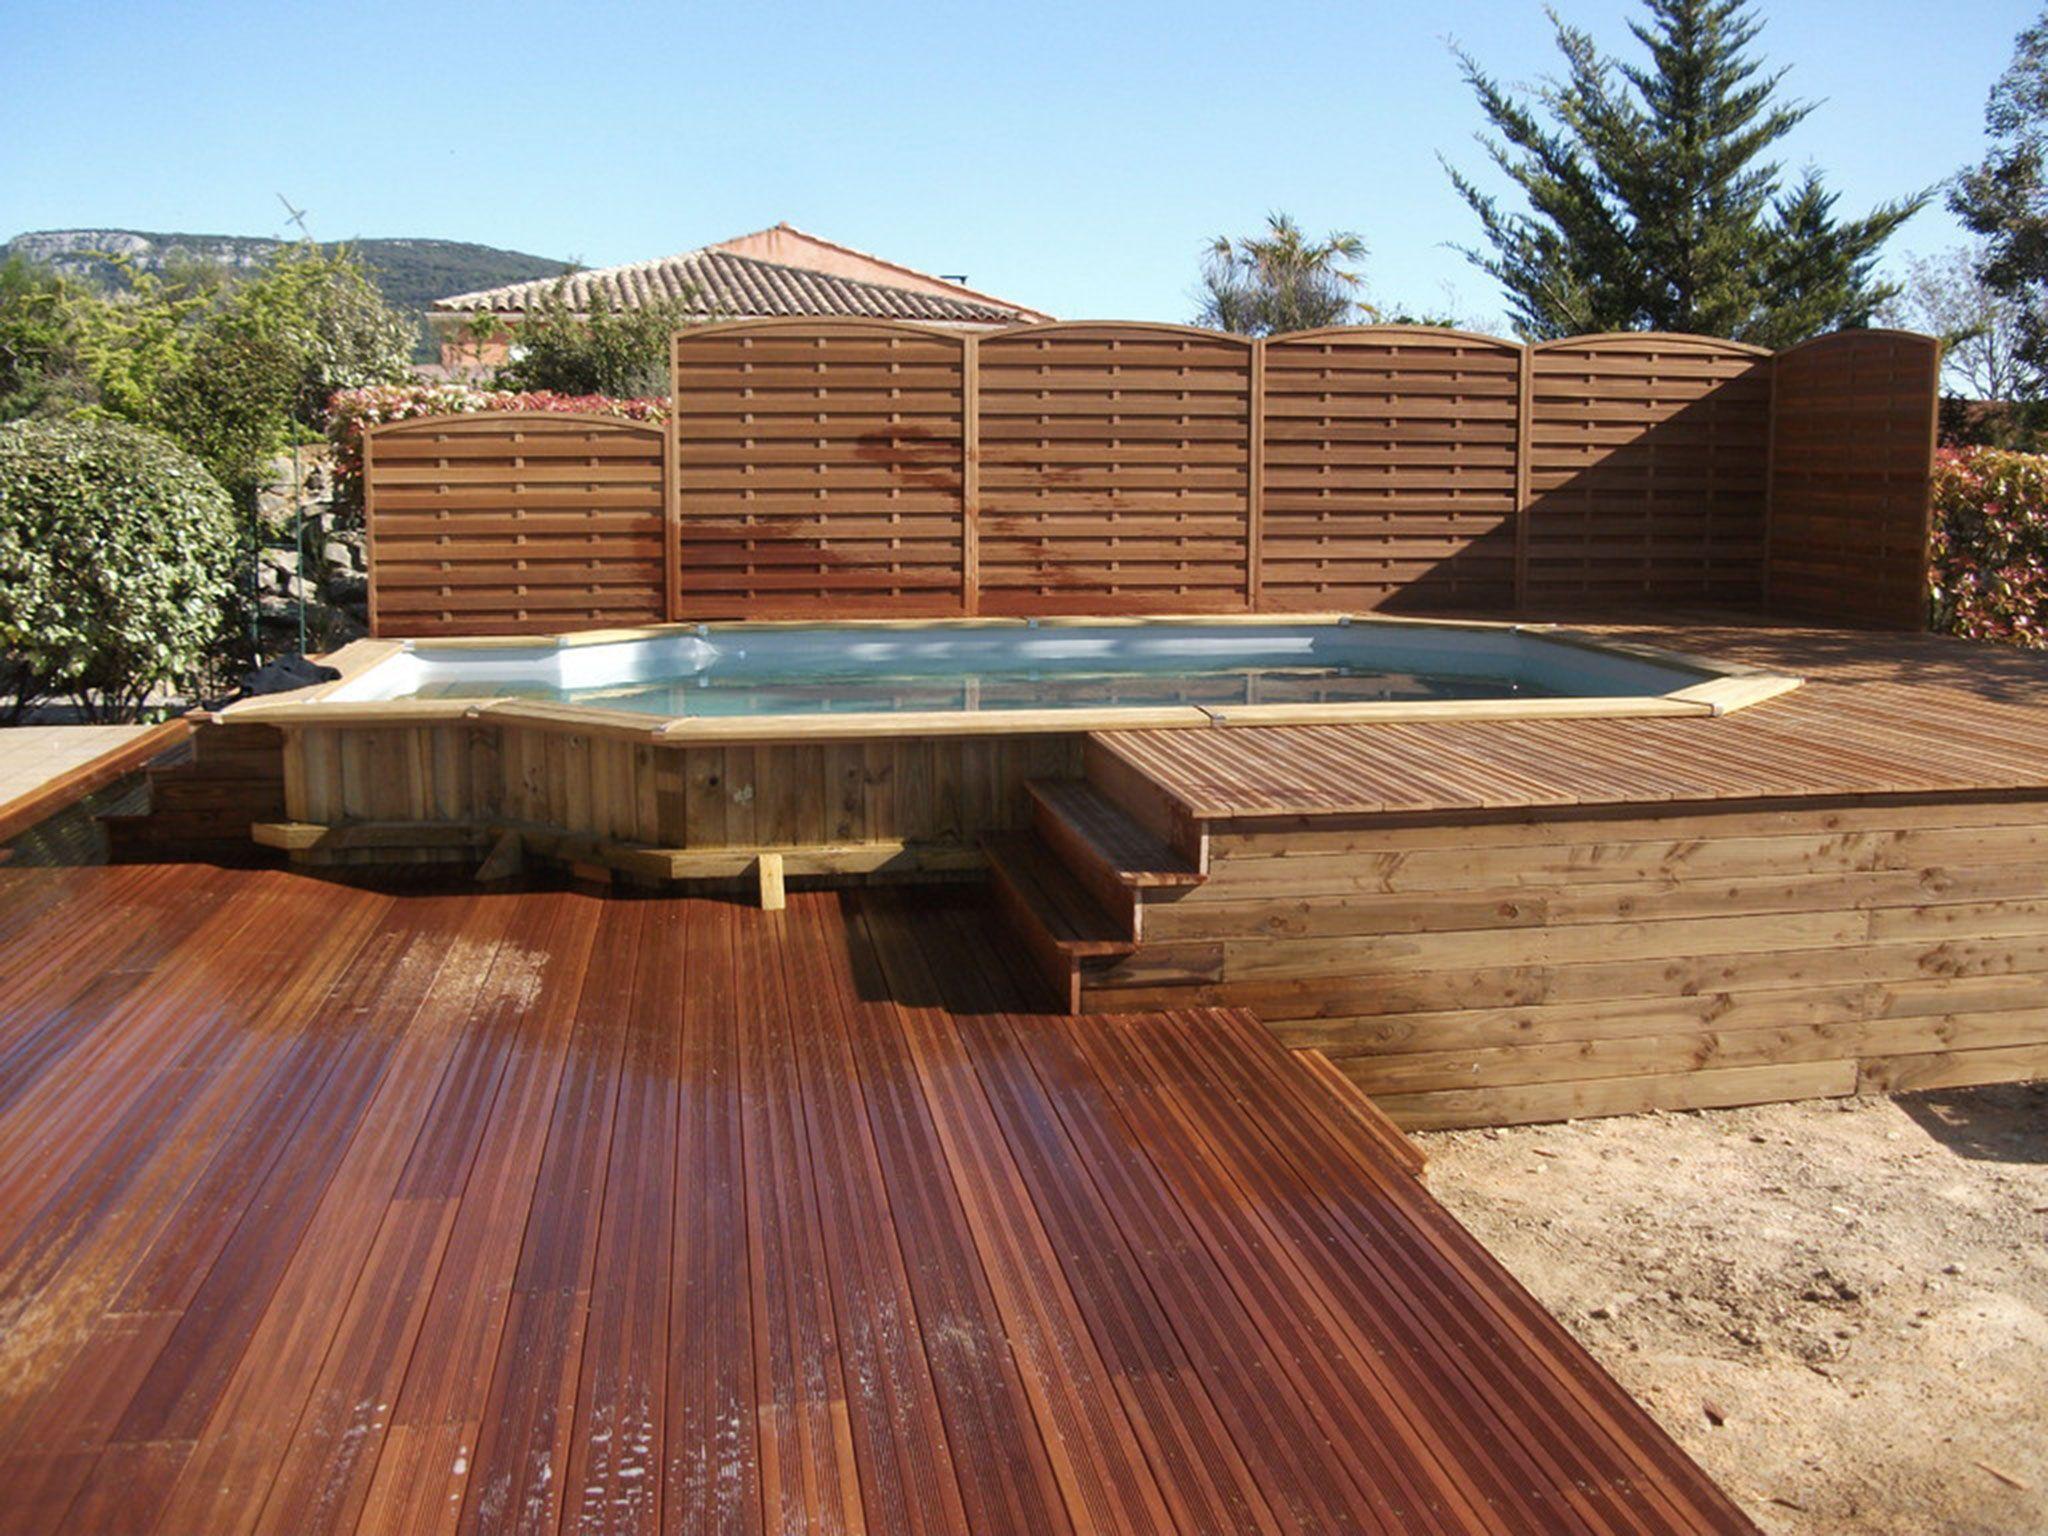 Piscine semi enterrée en bois | pool | Pinterest | Swimming pools